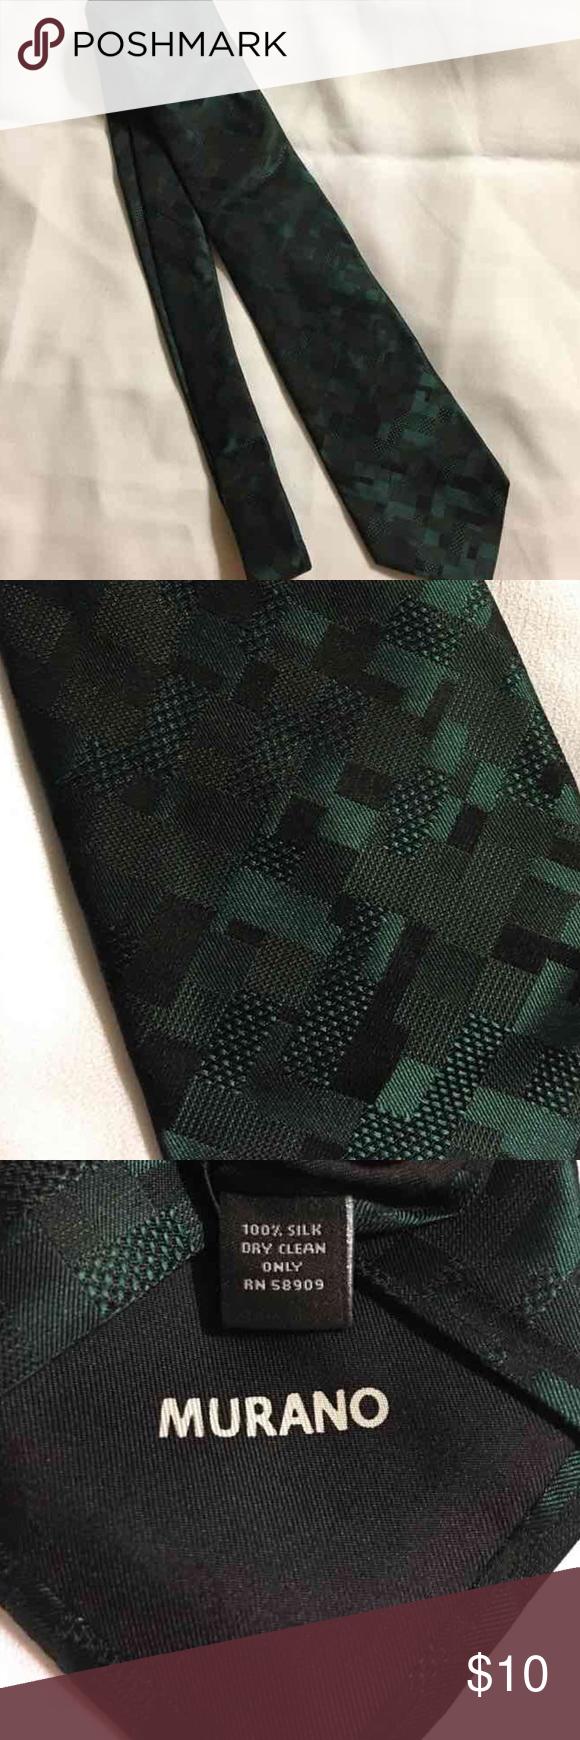 Murano 100% Silk Men's Tie. Deep green color. EUC. 100% Silk. No rips,stains, etc. Murano Accessories Ties